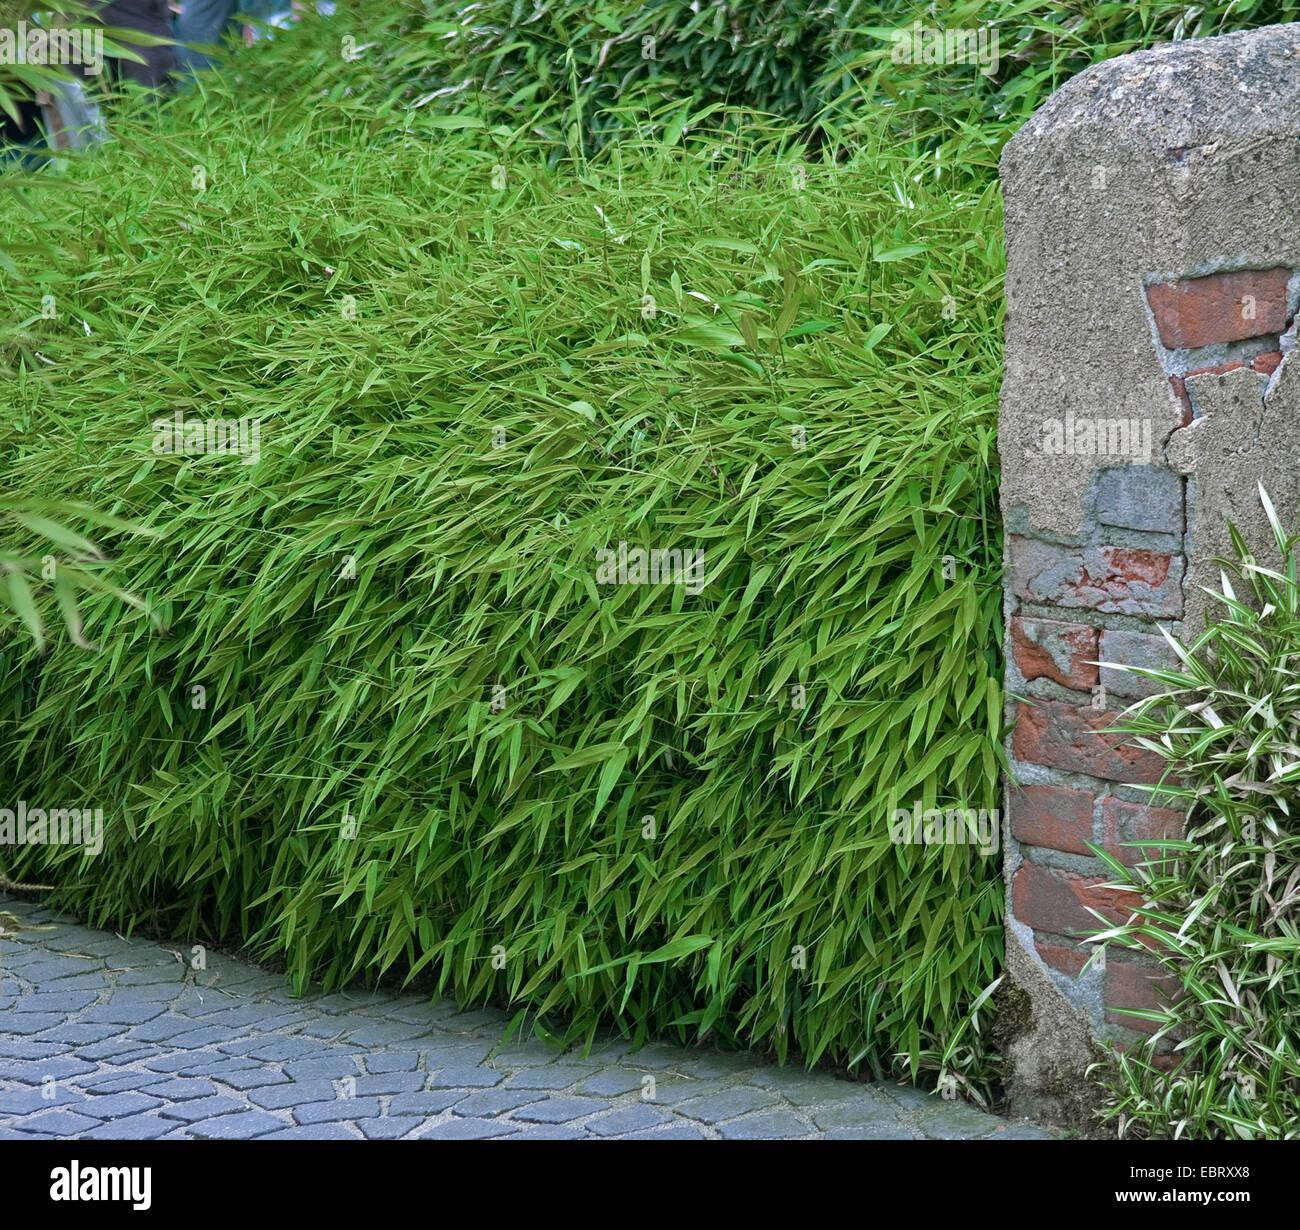 fargesia fargesia rufa bamboo hedge stock photo royalty free image 76128704 alamy. Black Bedroom Furniture Sets. Home Design Ideas